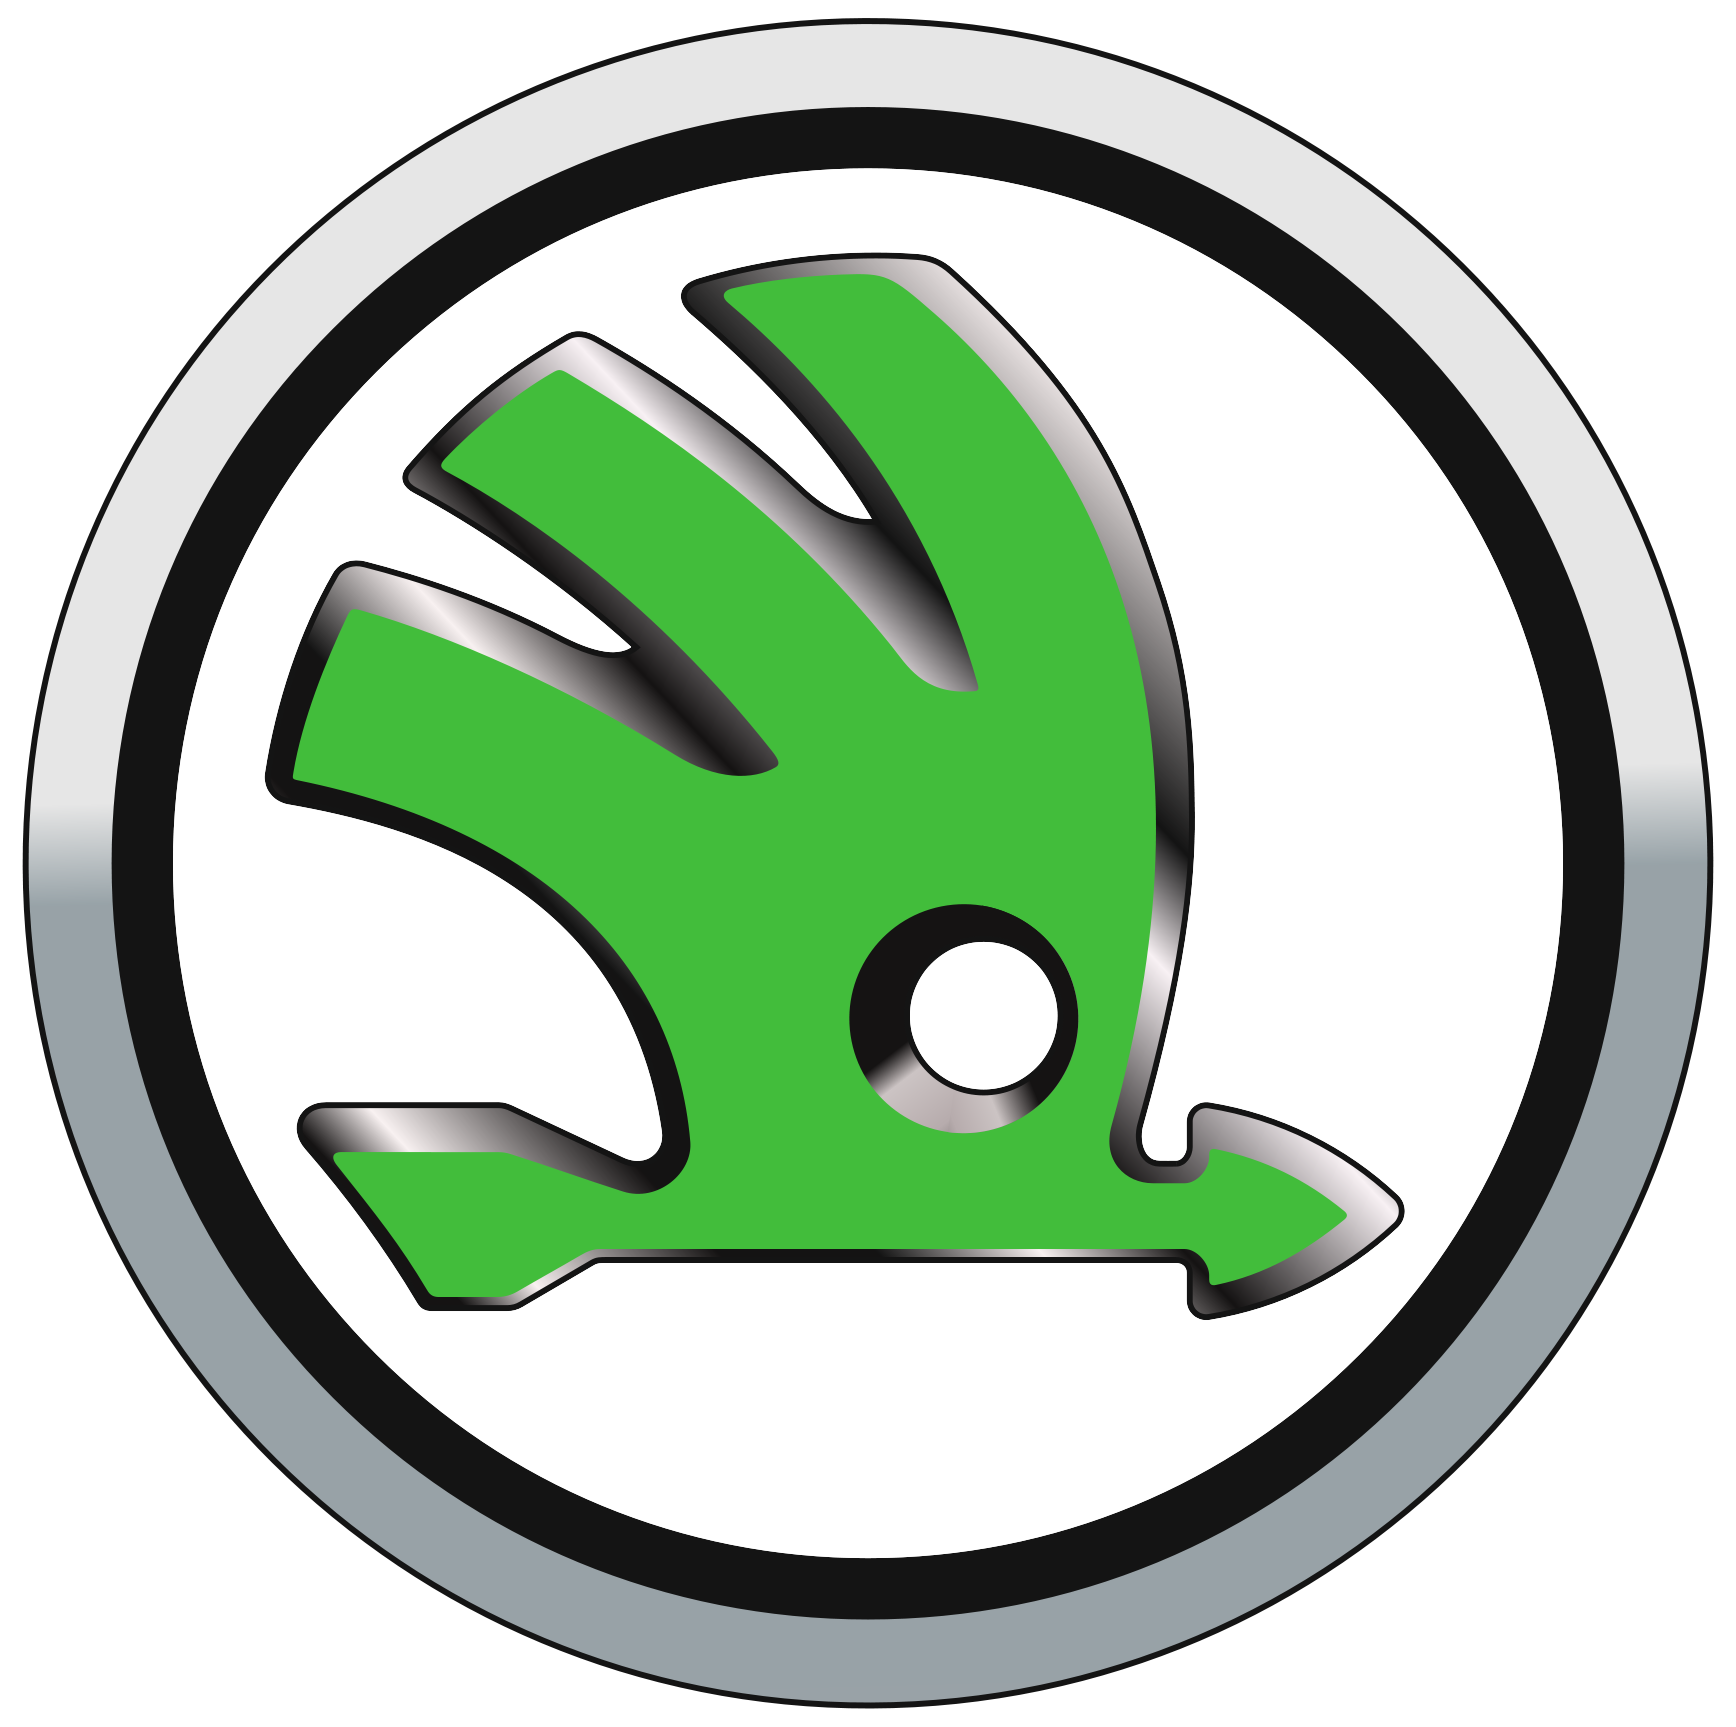 Batman logo png picture 2037 Free Transparent PNG Logos